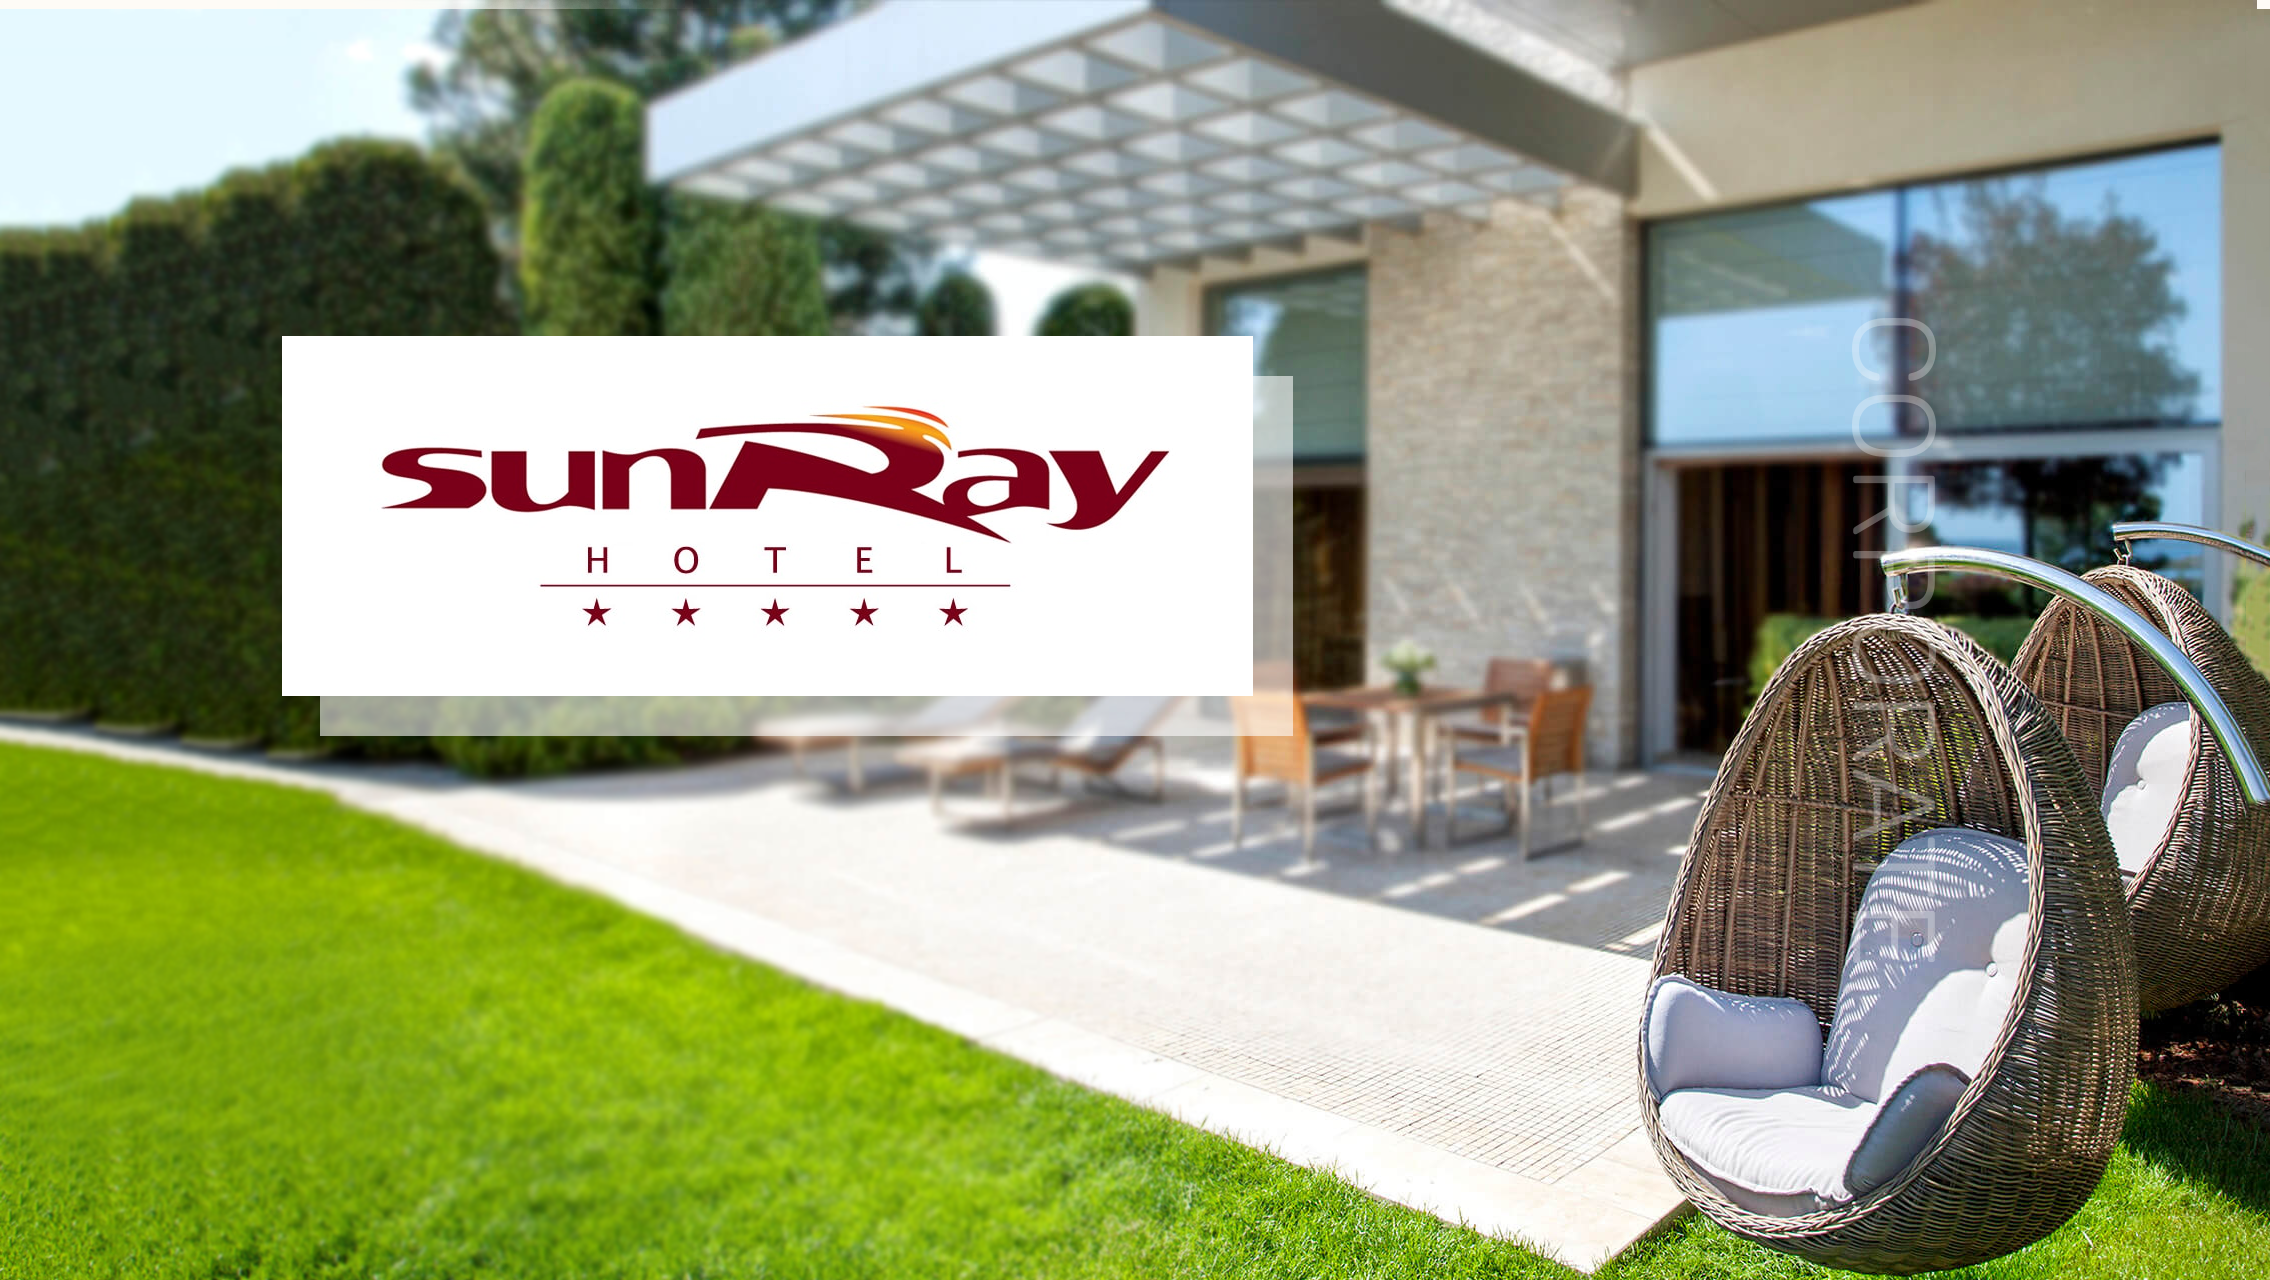 Содание корпоративного сайта отеля SUNRAY